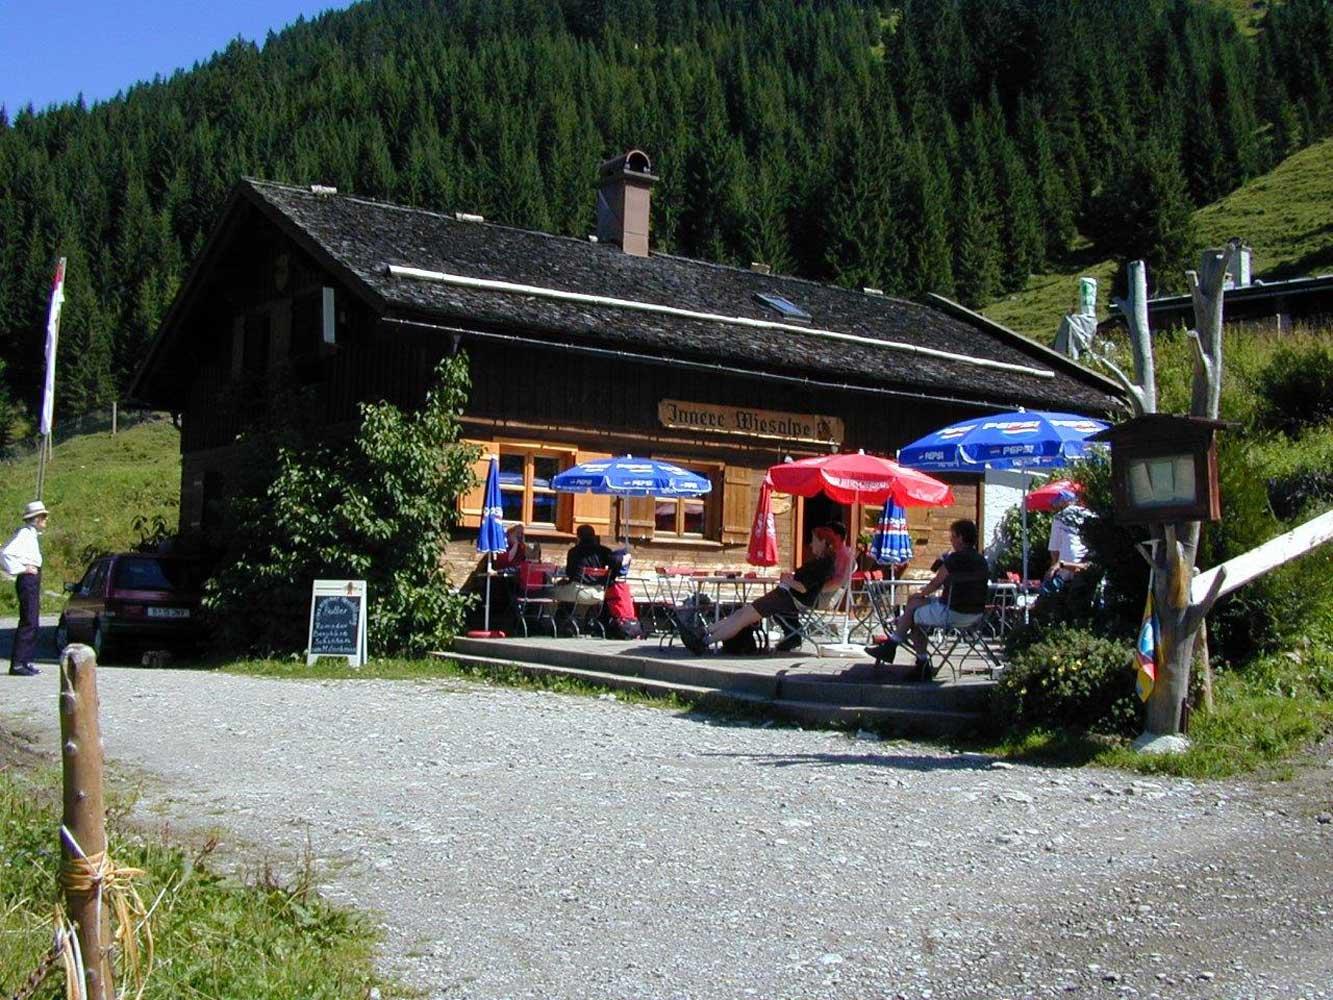 Innere Wiesalpe Kleinwalsertal, Ausflugsziel, Alpe, Brotzeit – Terrasse